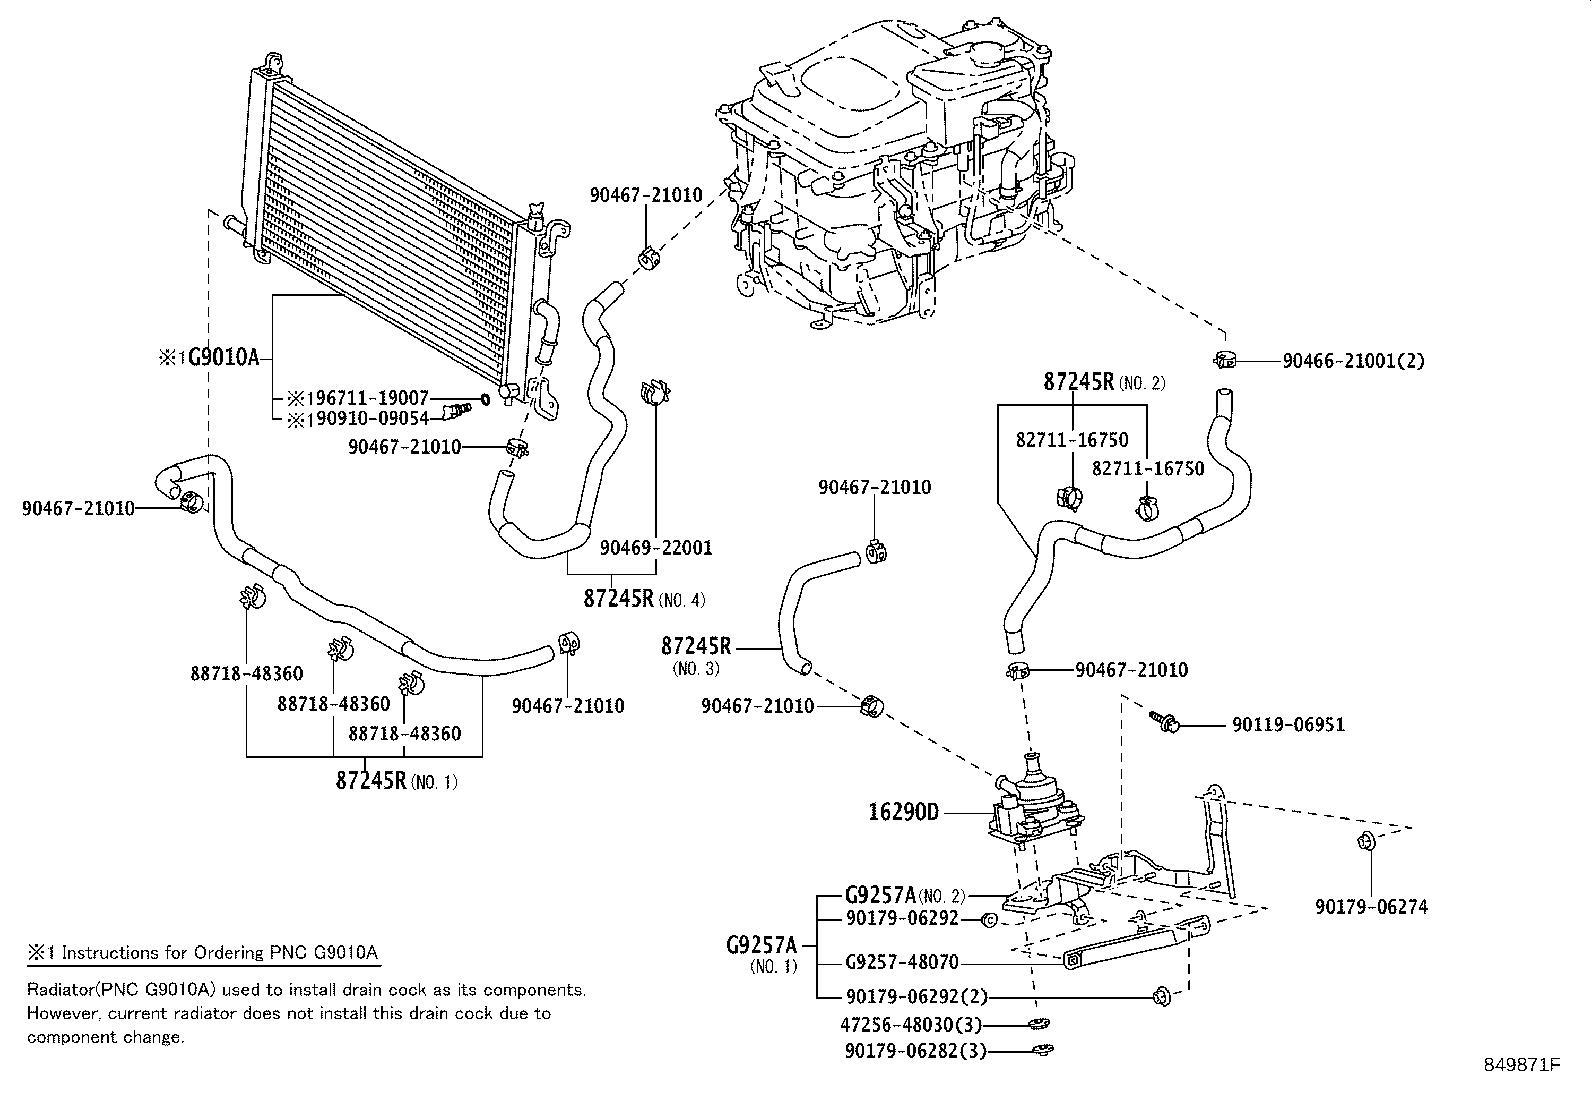 2006 Lexus Drive Motor Inverter Cooler Water Pump. Coolant